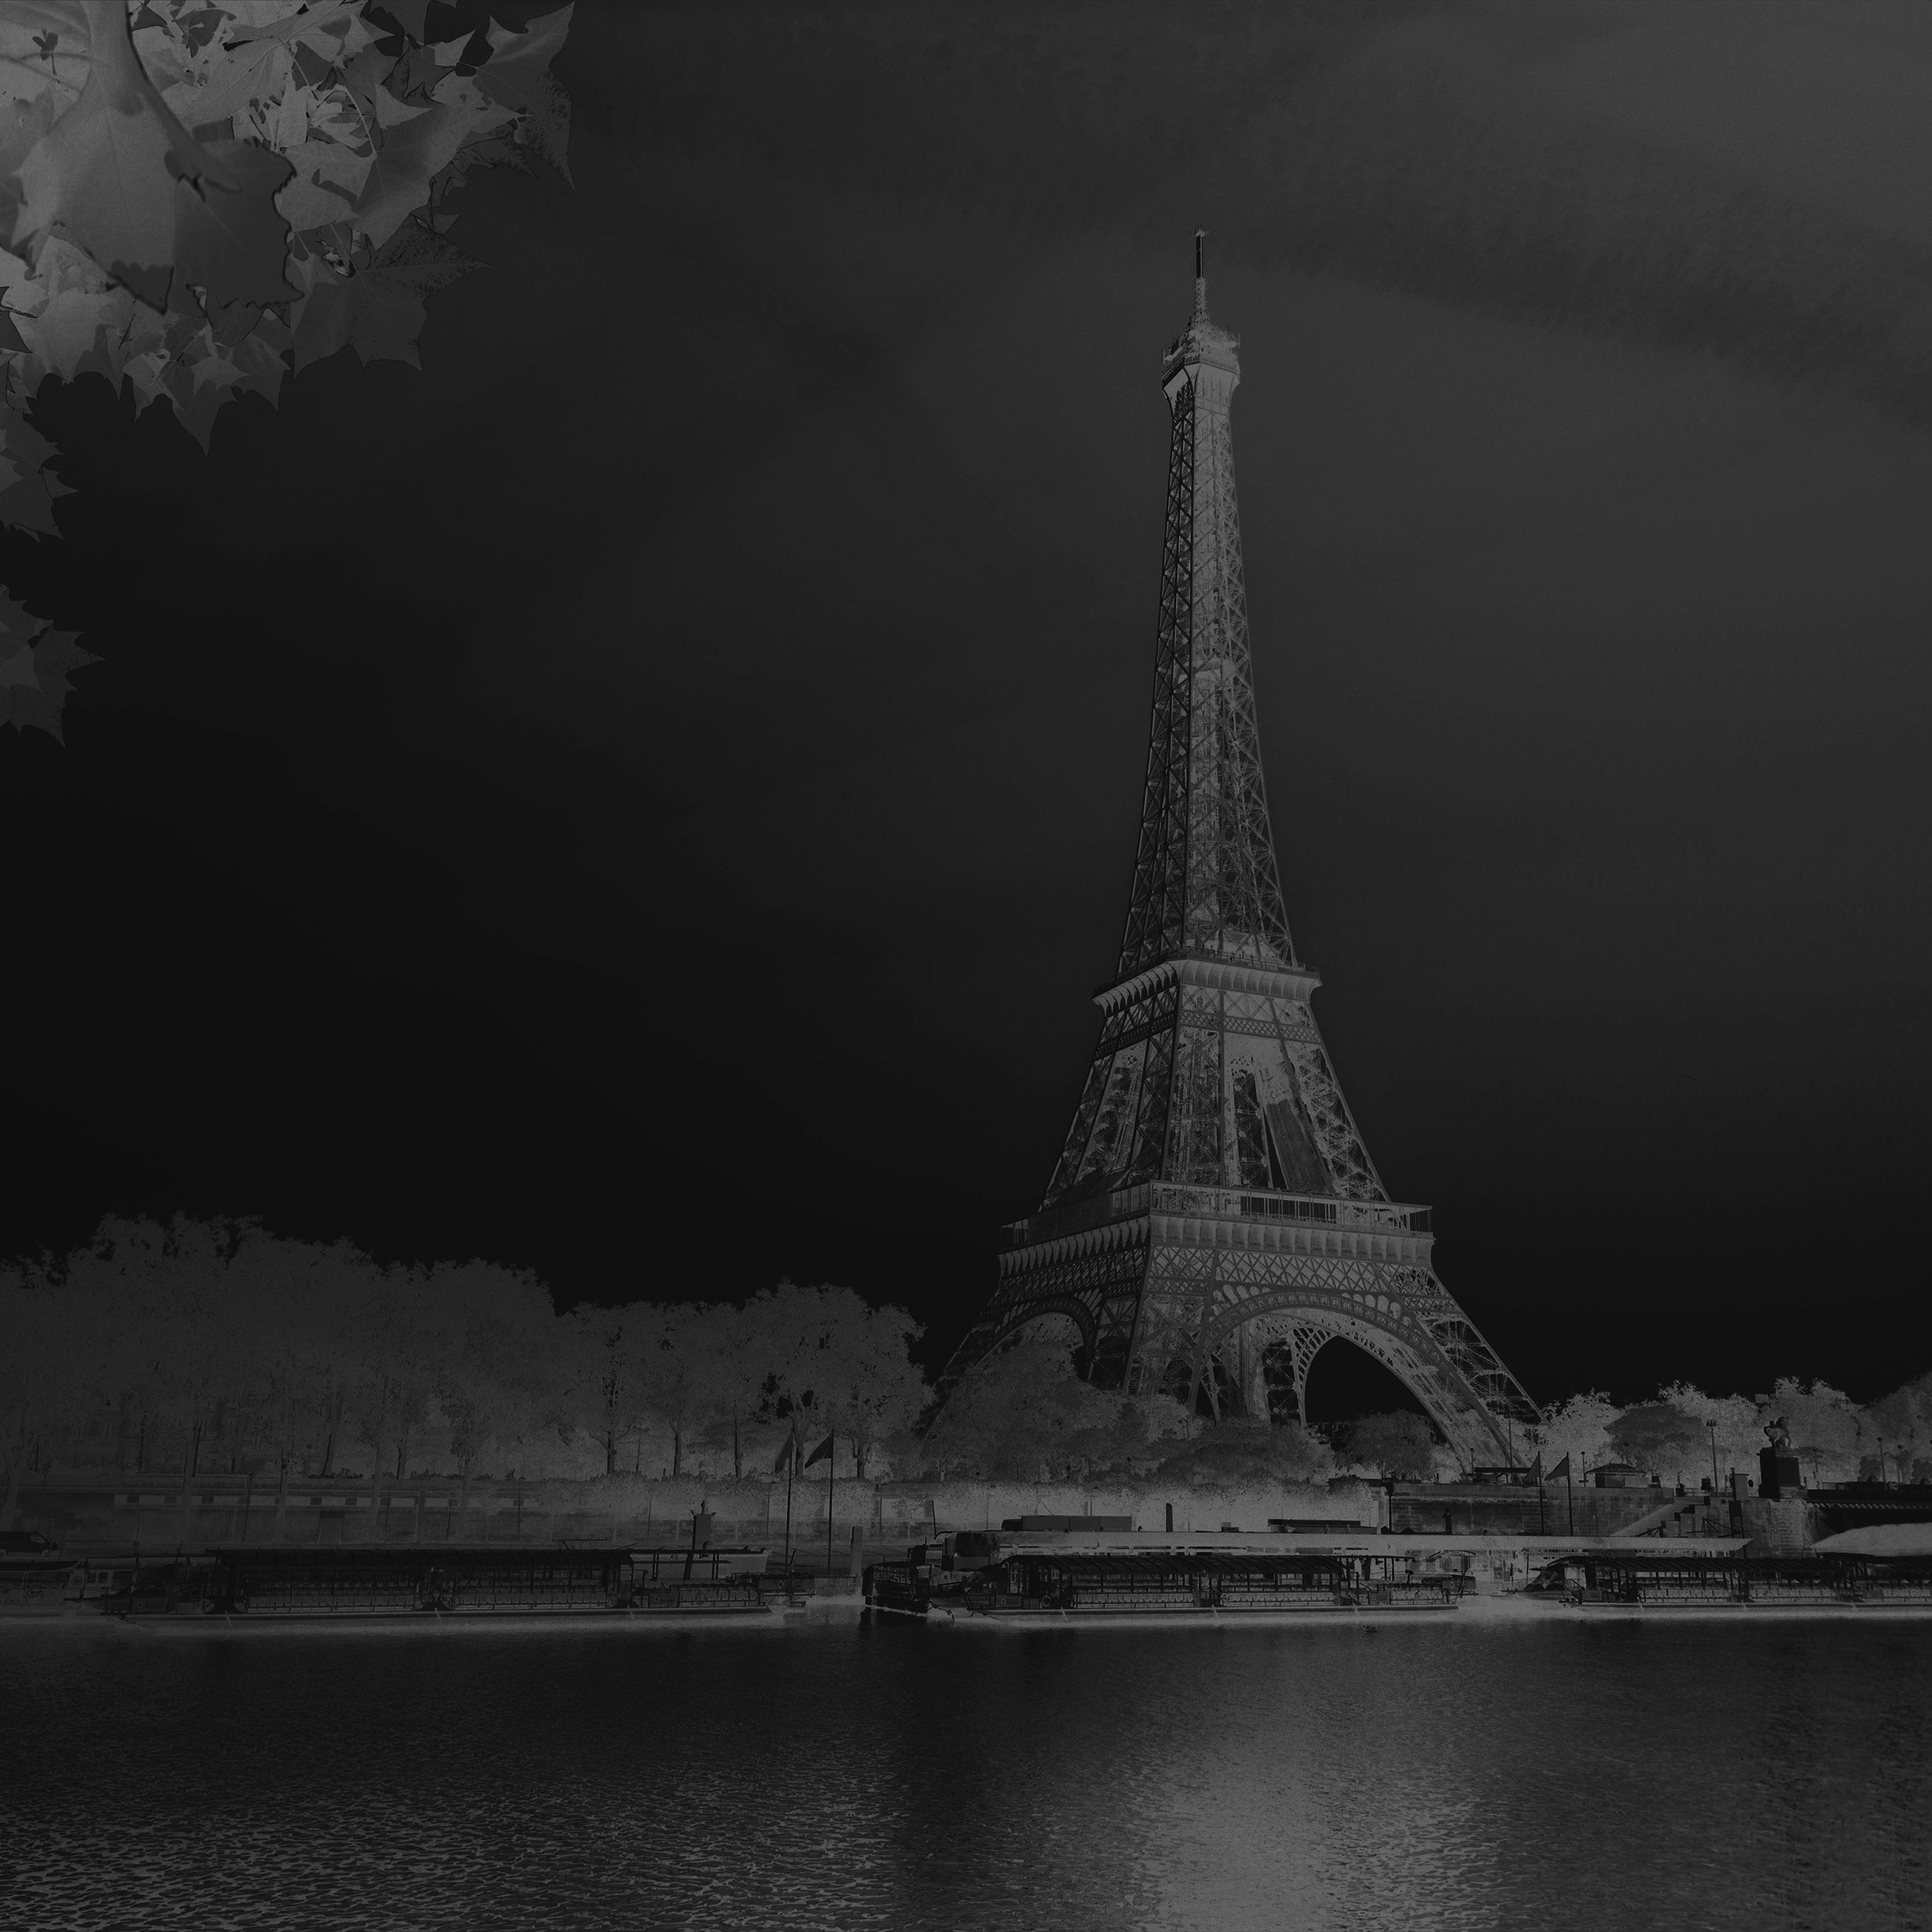 Na19 Sky Dark Bw Black Eiffel Tower Nature Paris City Wallpaper